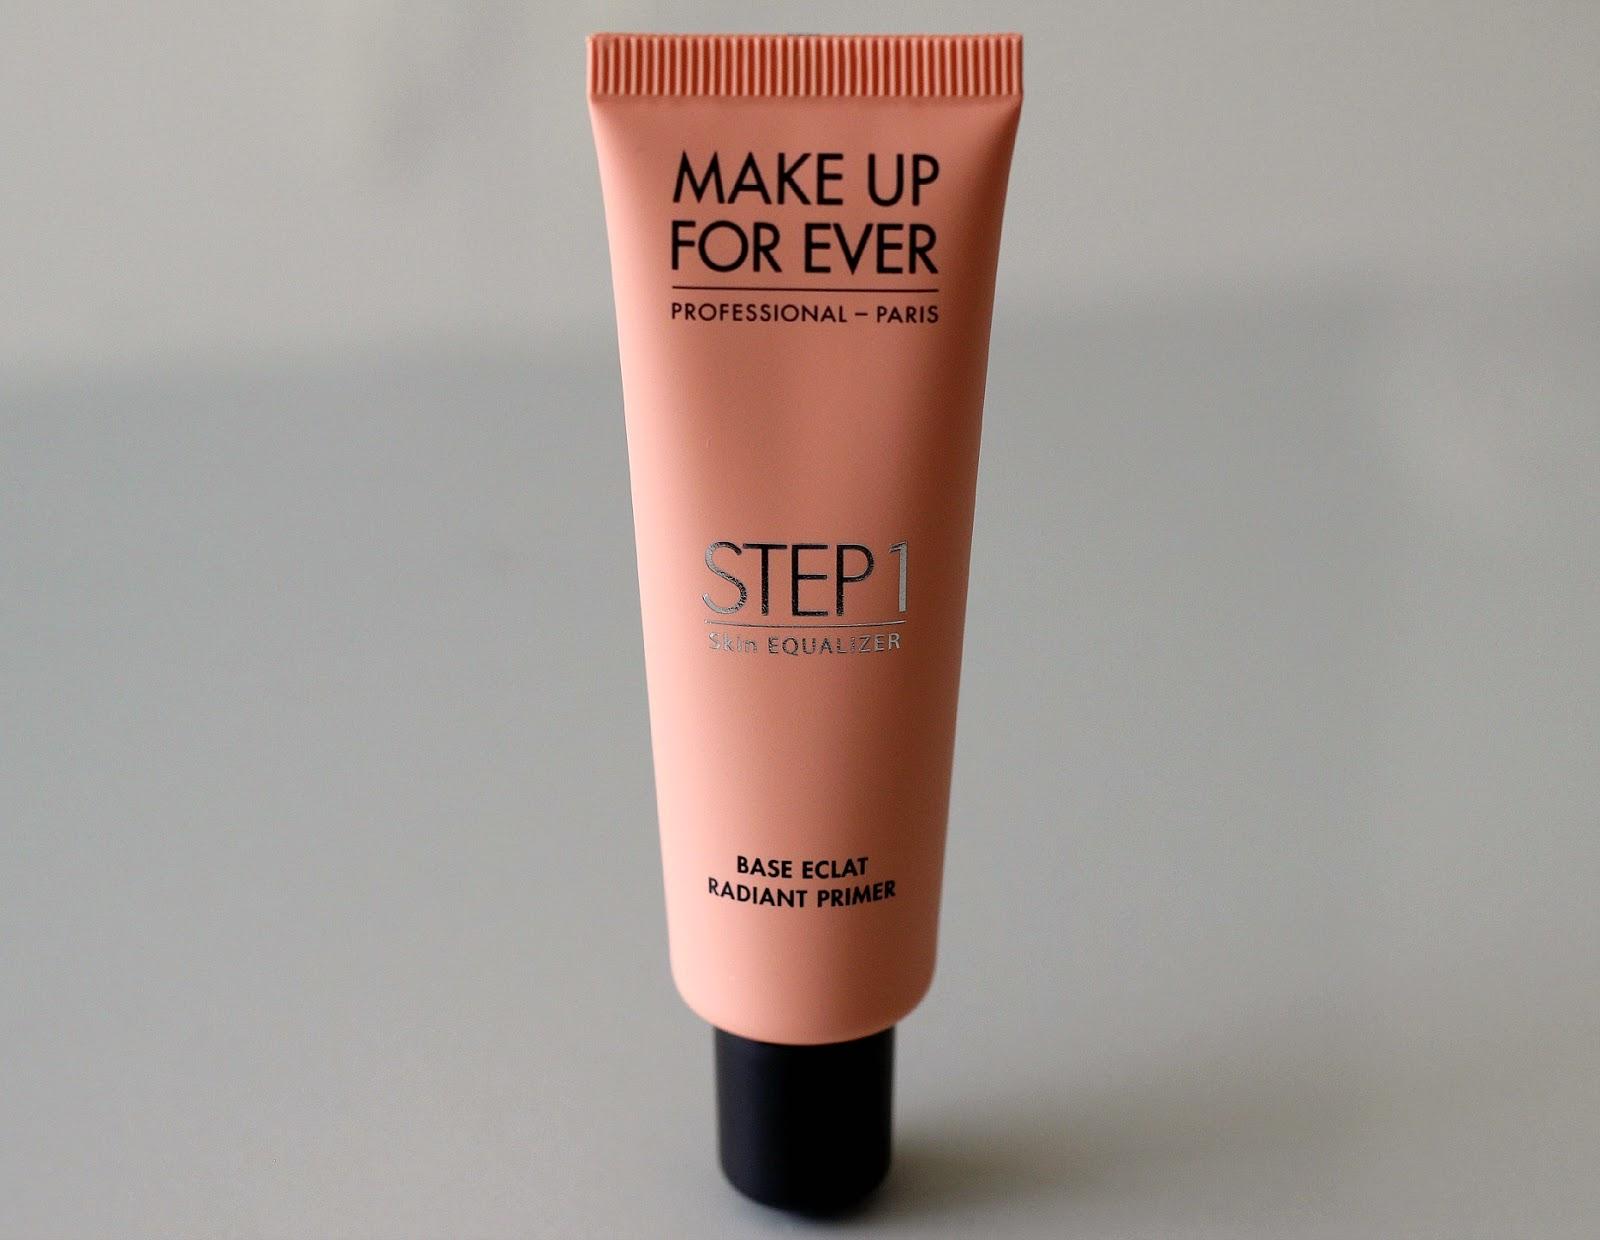 Step 1 skin equalizer база под макияж корректирующая